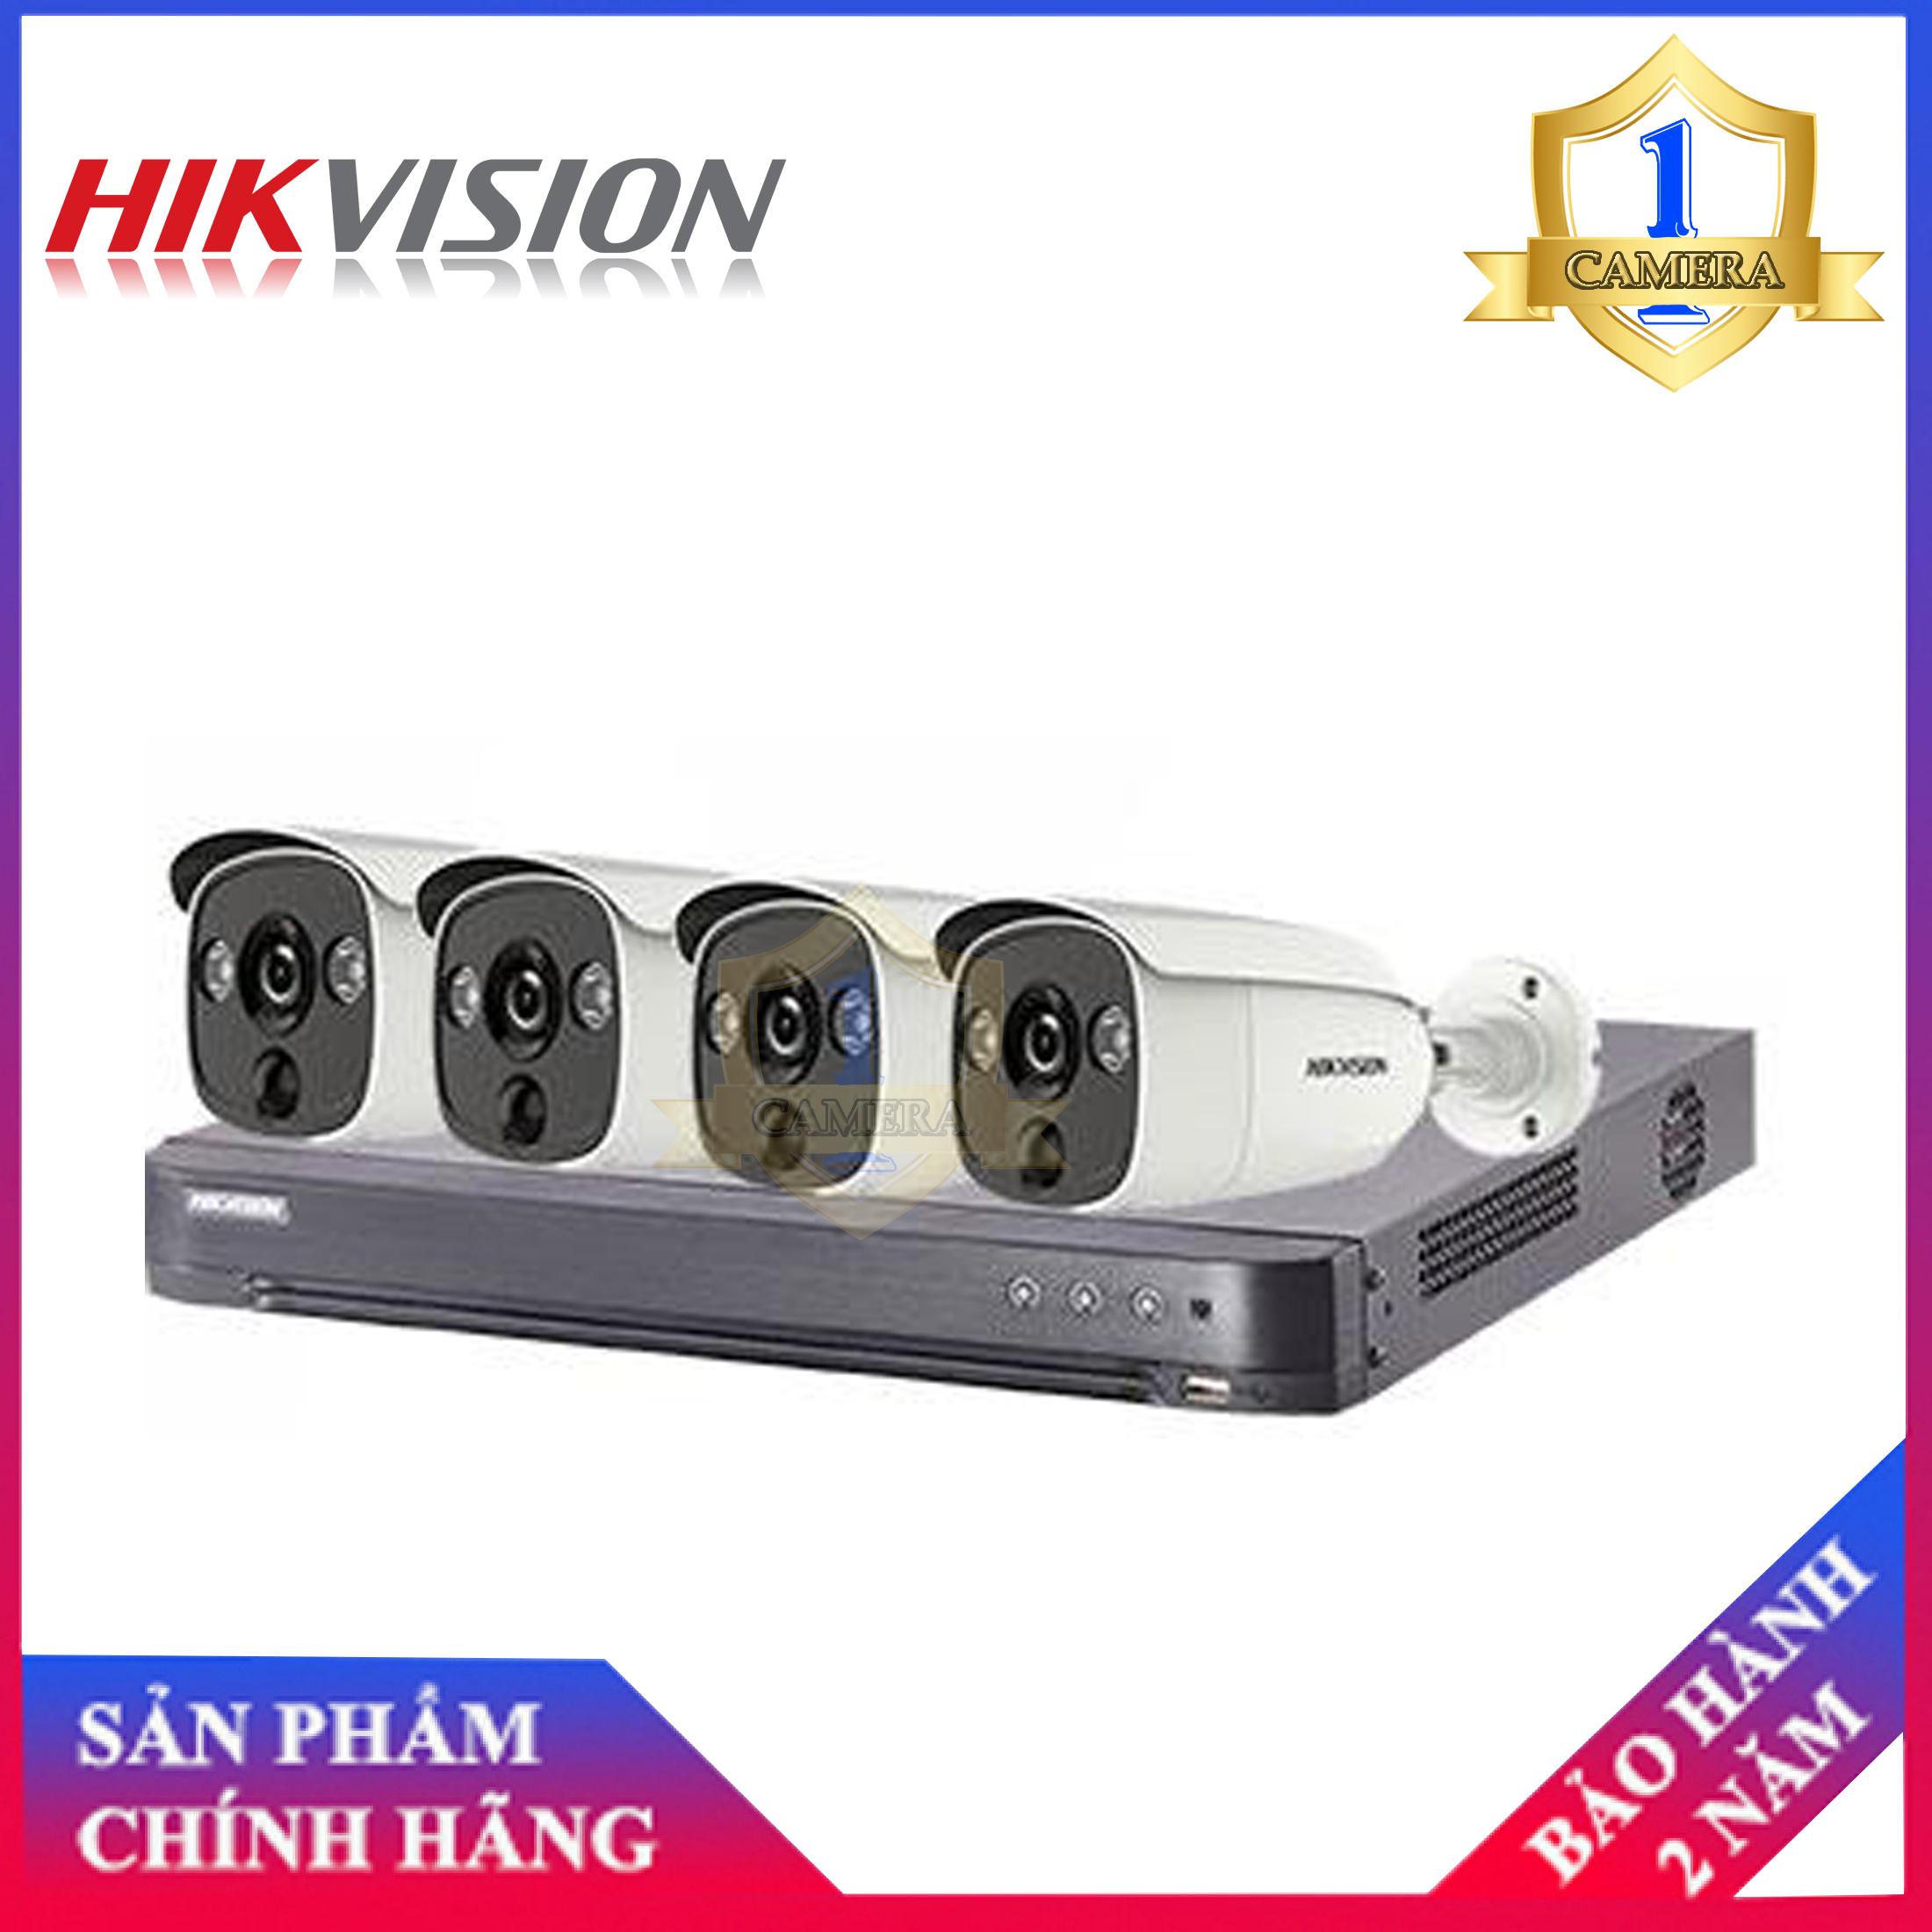 Trọn bộ 4 camera Hikvision DS-2CE12H0T-PIRL (5MP) + đầu ghi 4 kênh DS-7204HUHI-K1